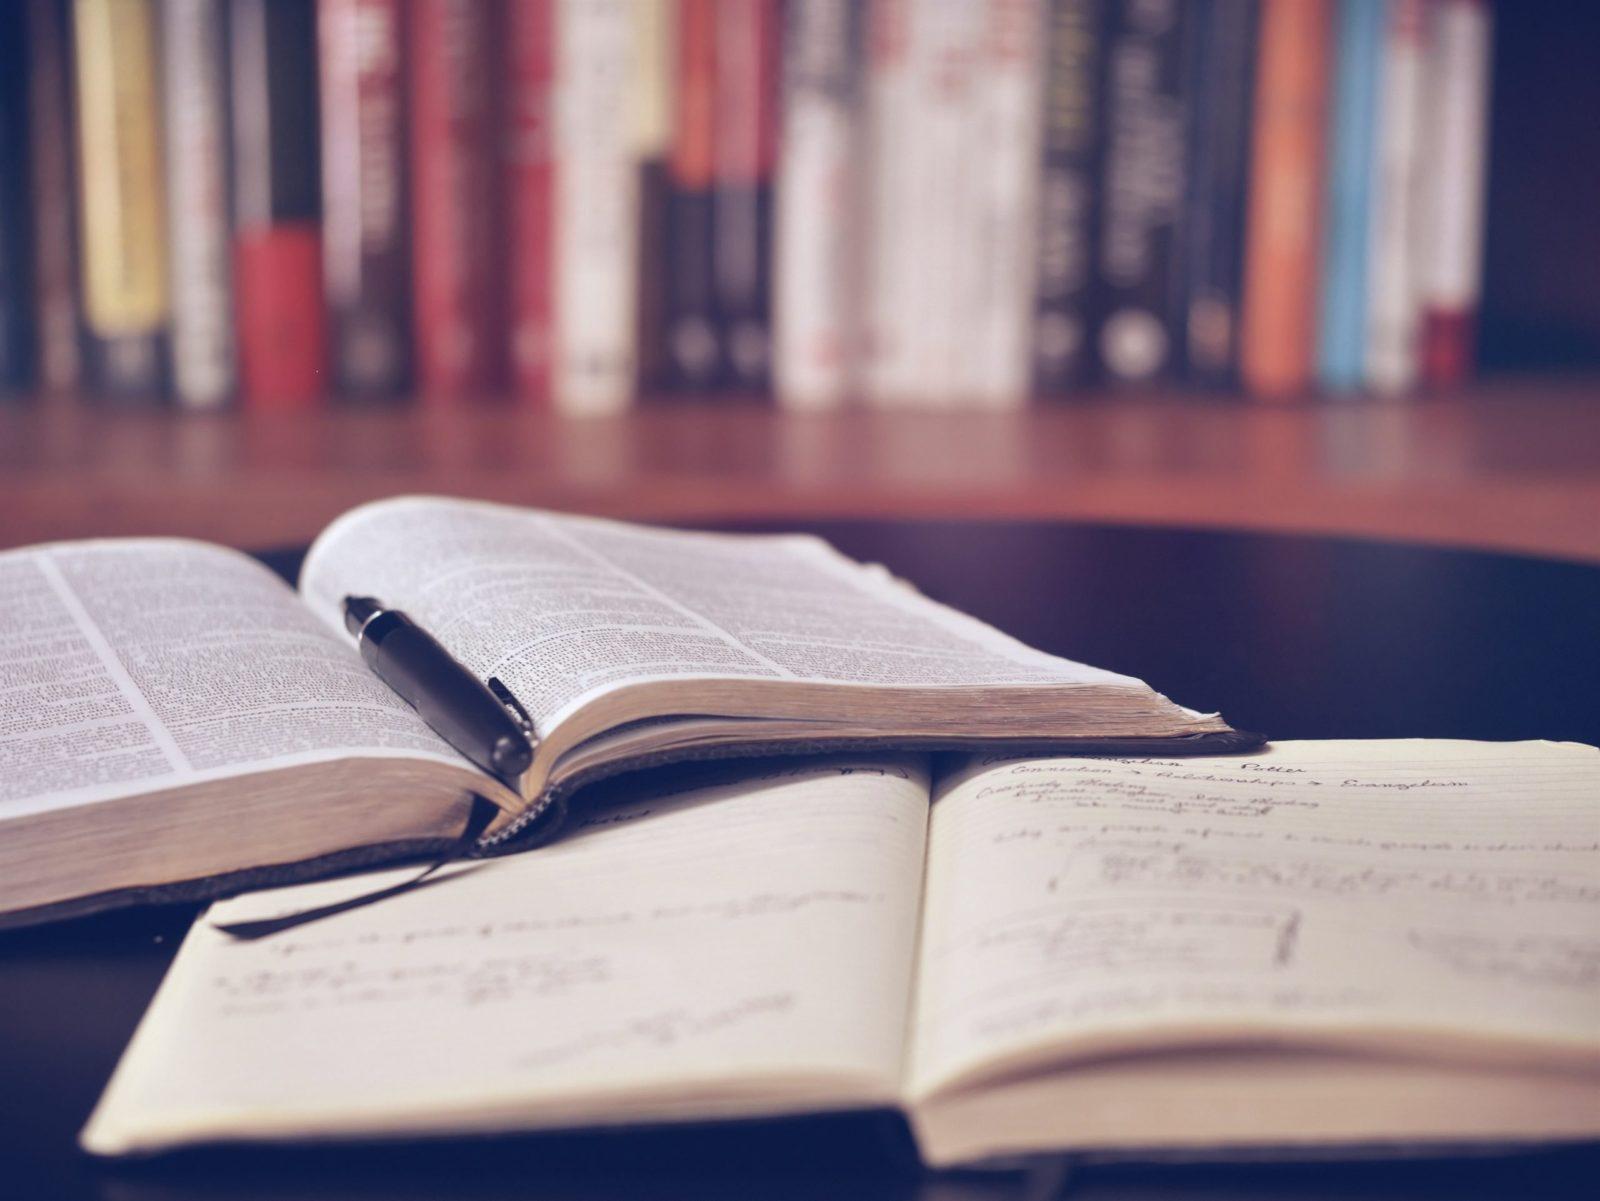 Chinese medicine books to study